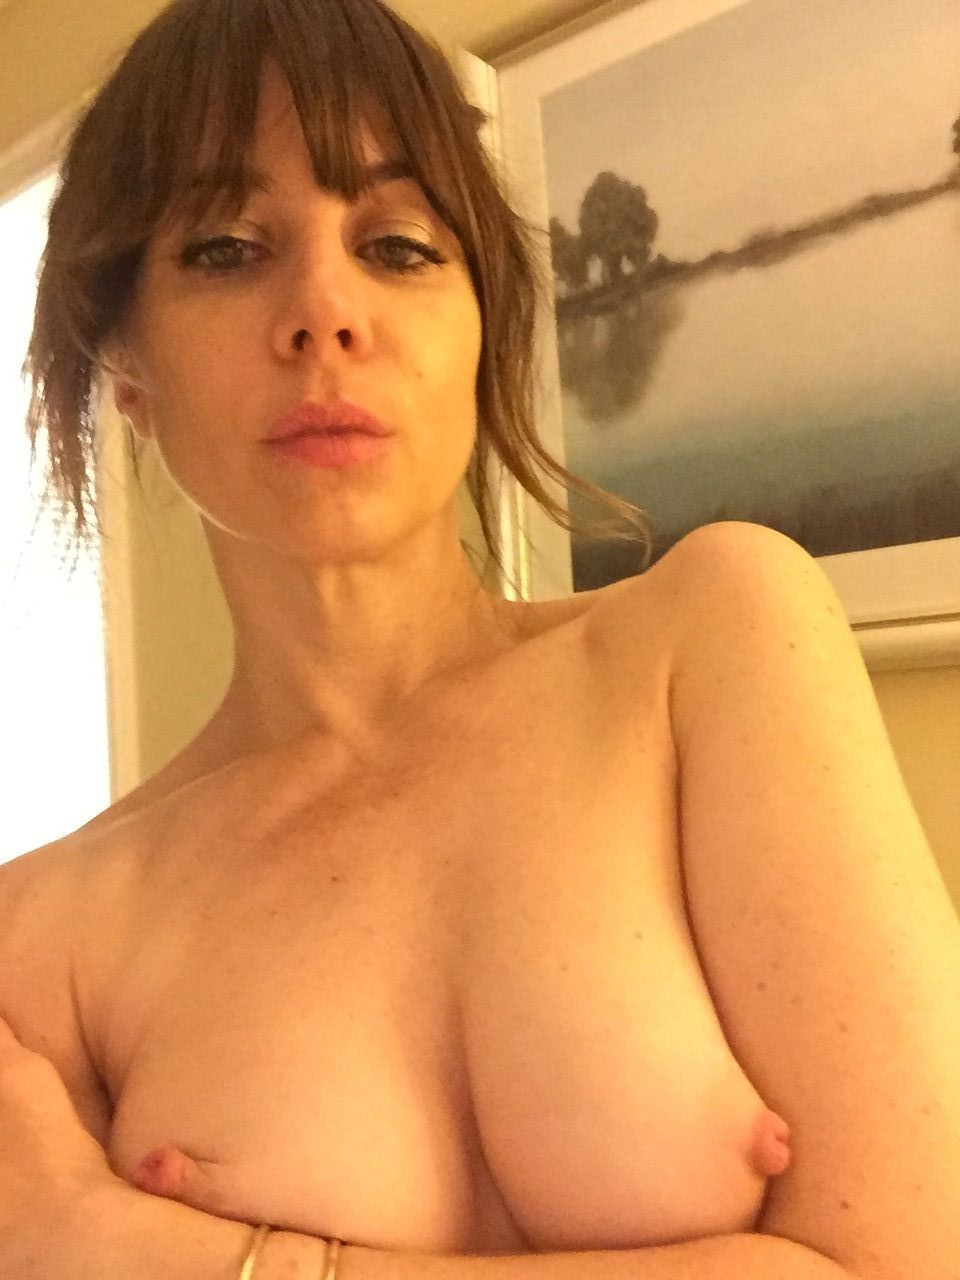 Natasha-Leggero-Nude-TheFappening-6.jpg